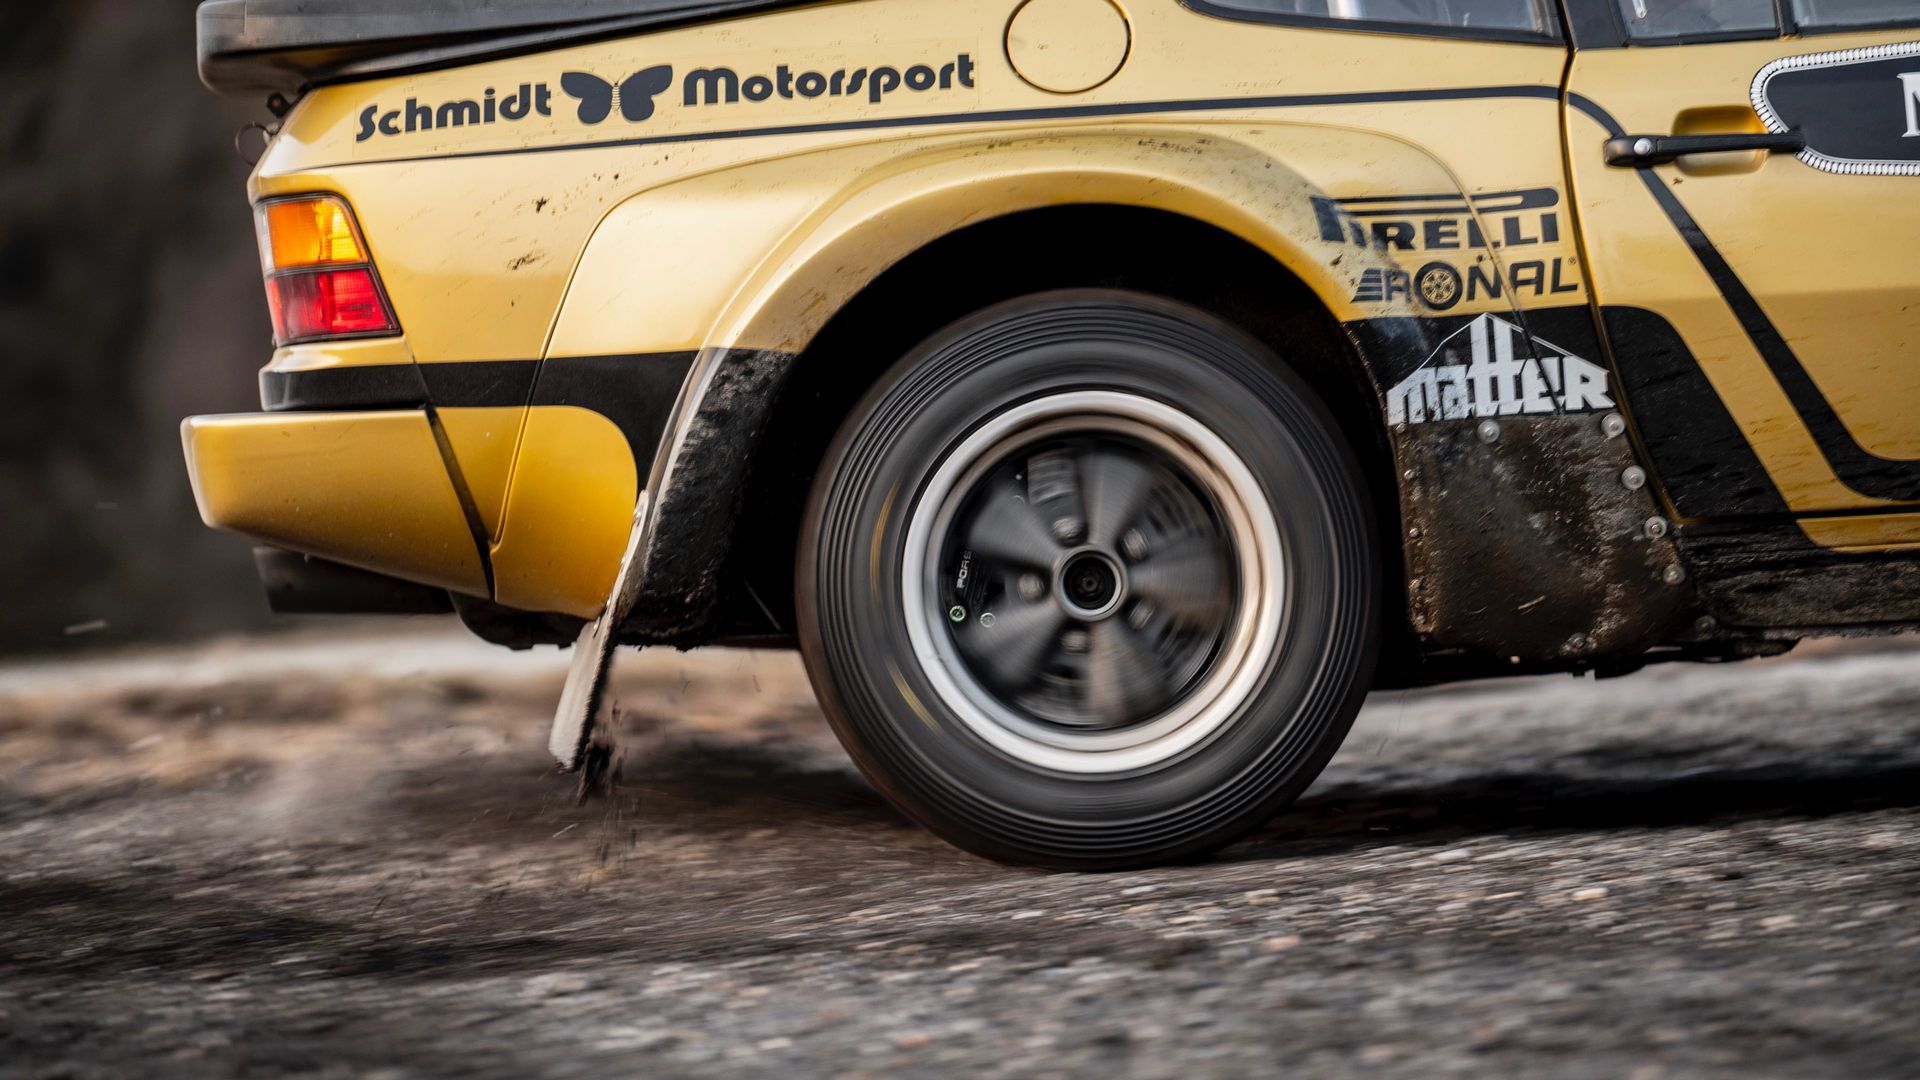 Porsche-924-Carrera-GTS-rally-car-Walter-Rohrl-16